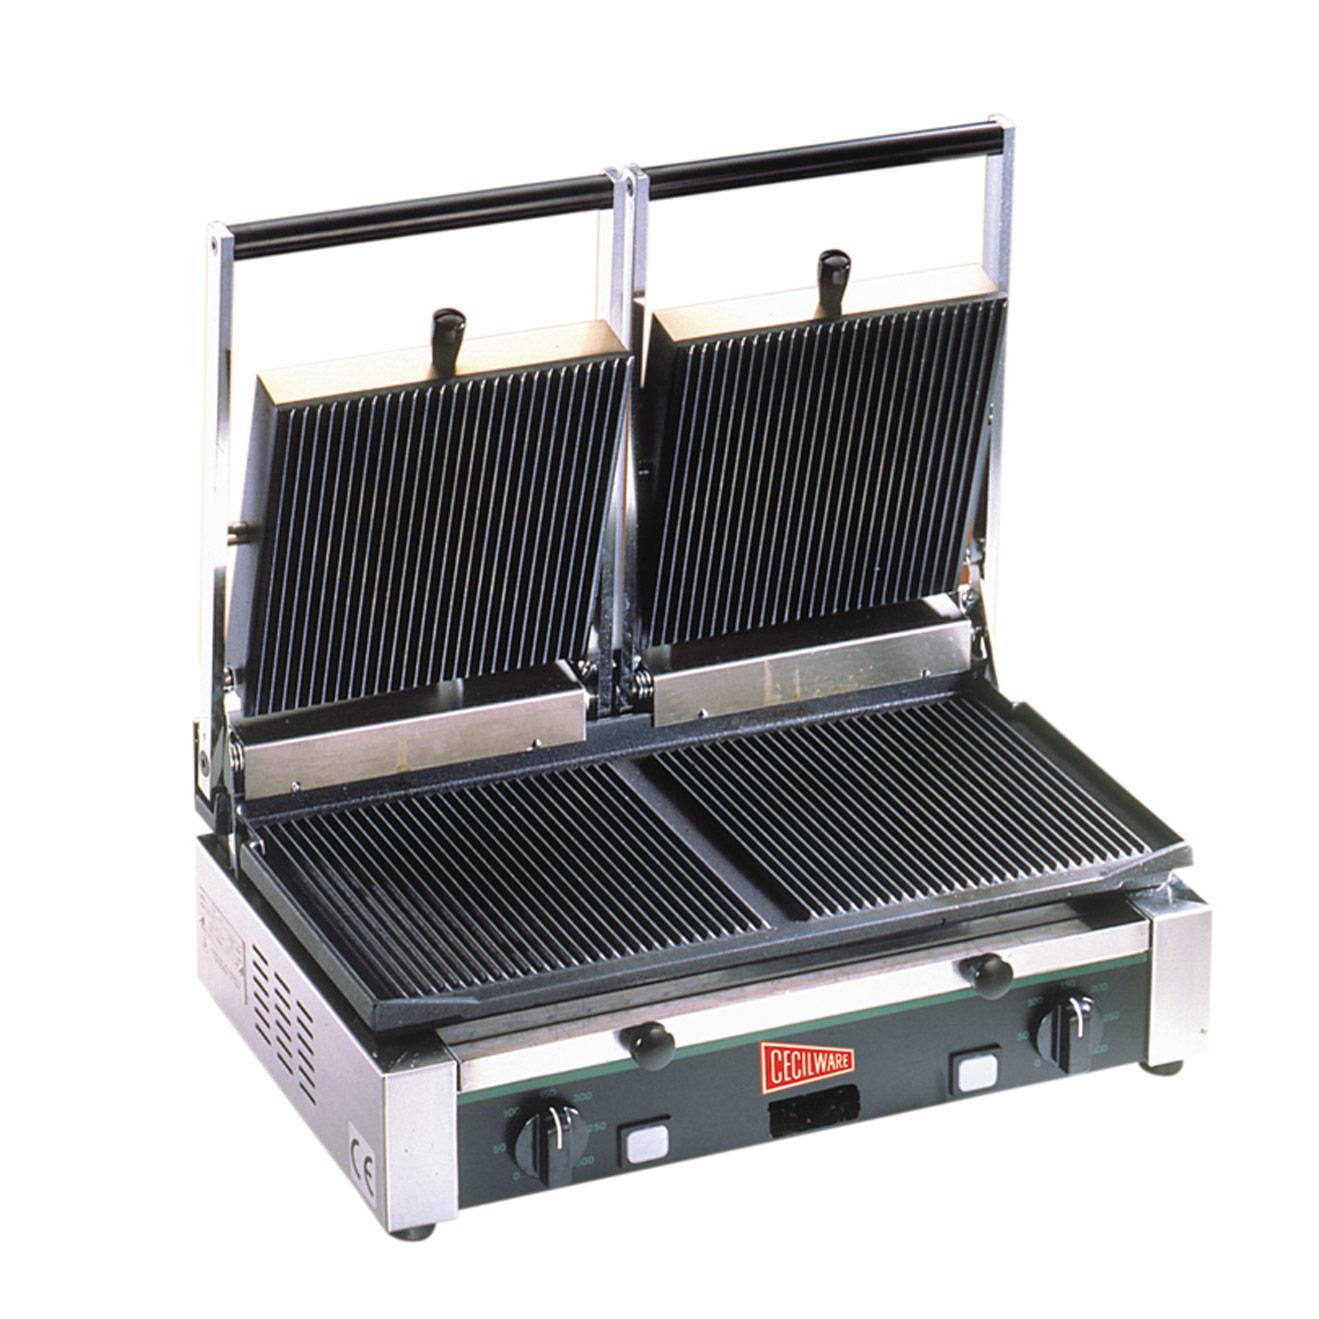 Grindmaster-Cecilware TSG2G sandwich / panini grill